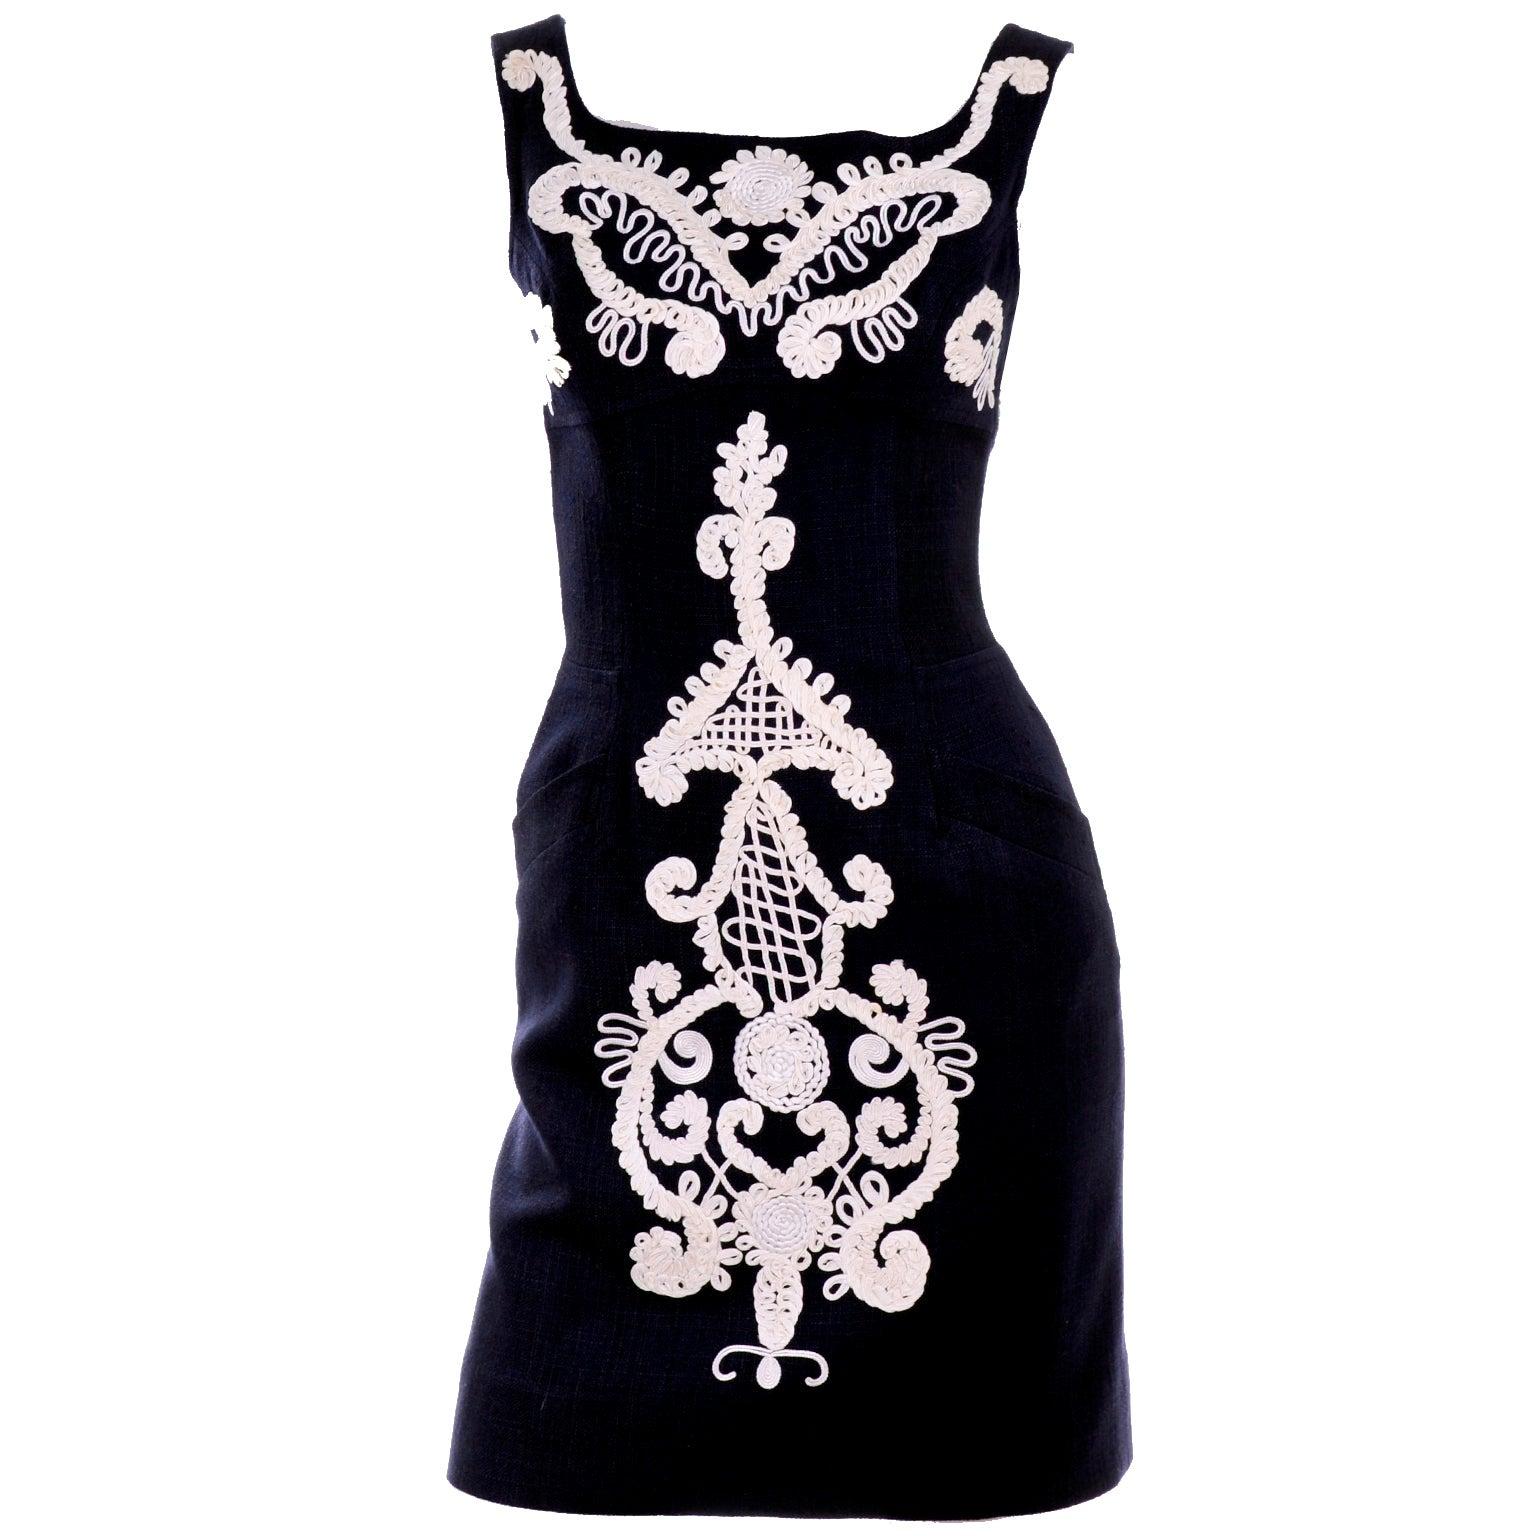 1993 Christian Lacroix Vintage Midnight Blue Dress W/ White Soutache Embroidery